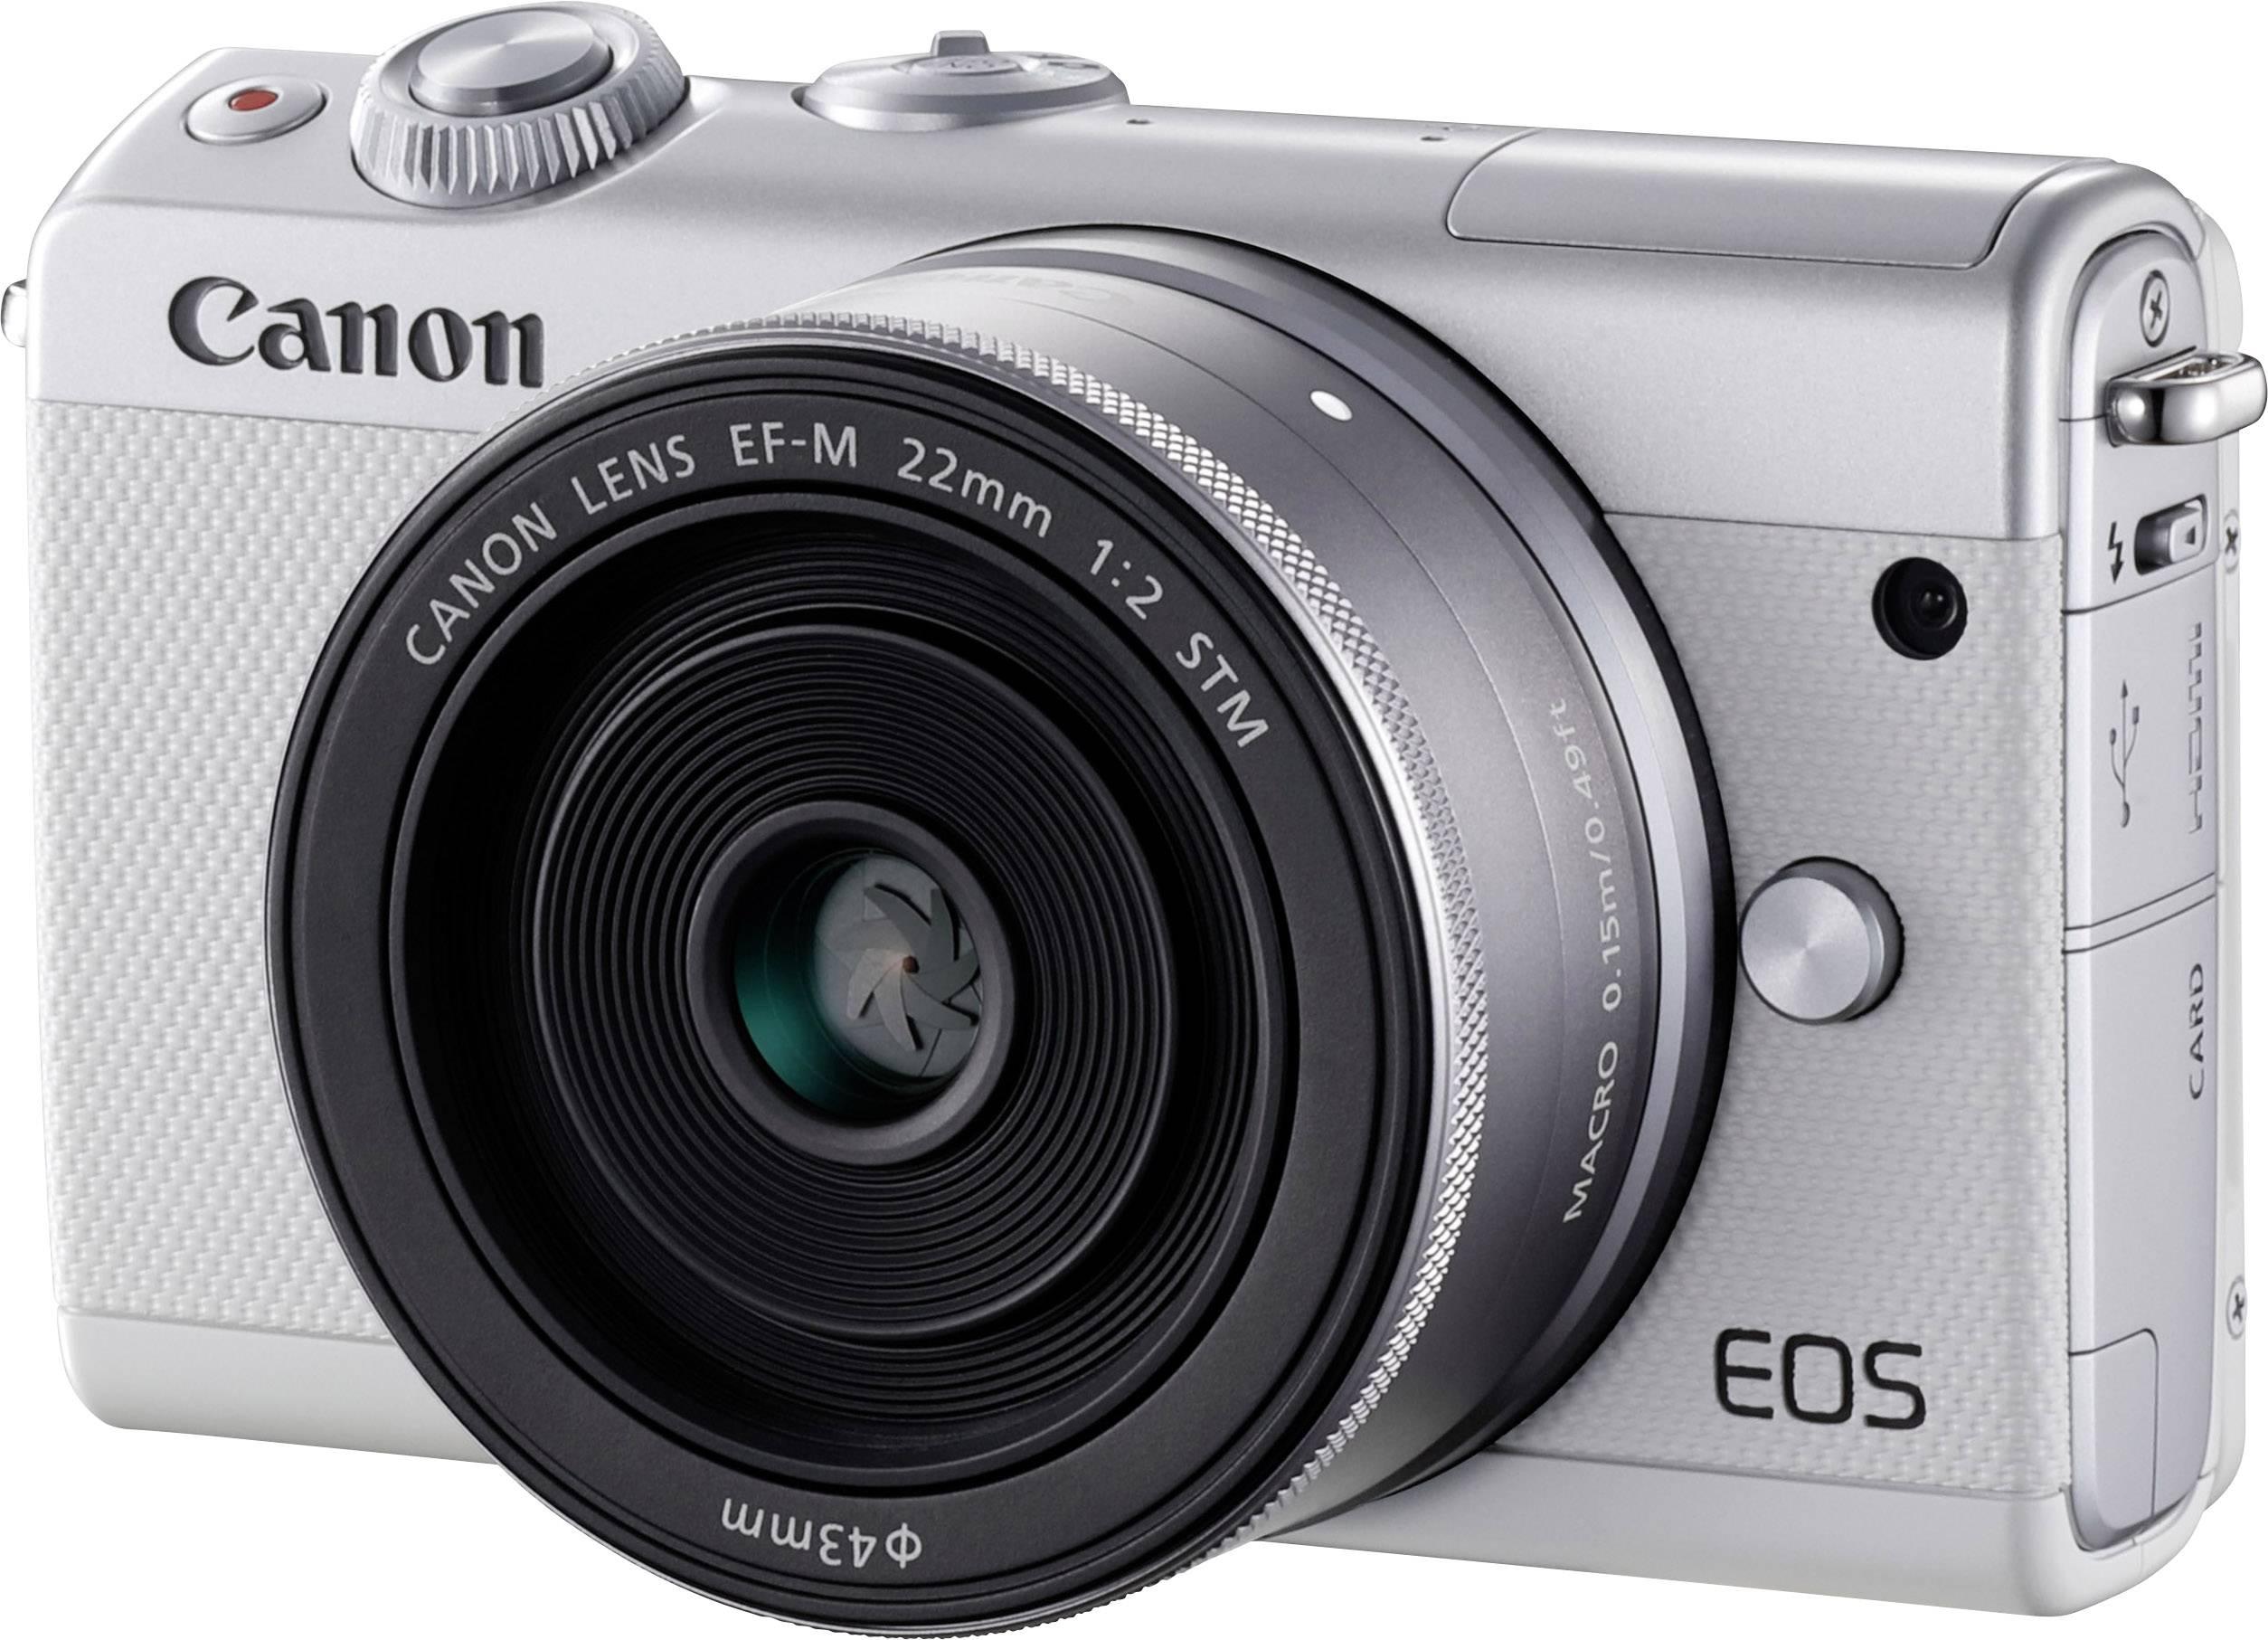 e69a22b9e7e630 Appareil photo hybride Canon EOS M100 24.2 Mill. pixel blanc WiFi,  Bluetooth, écran